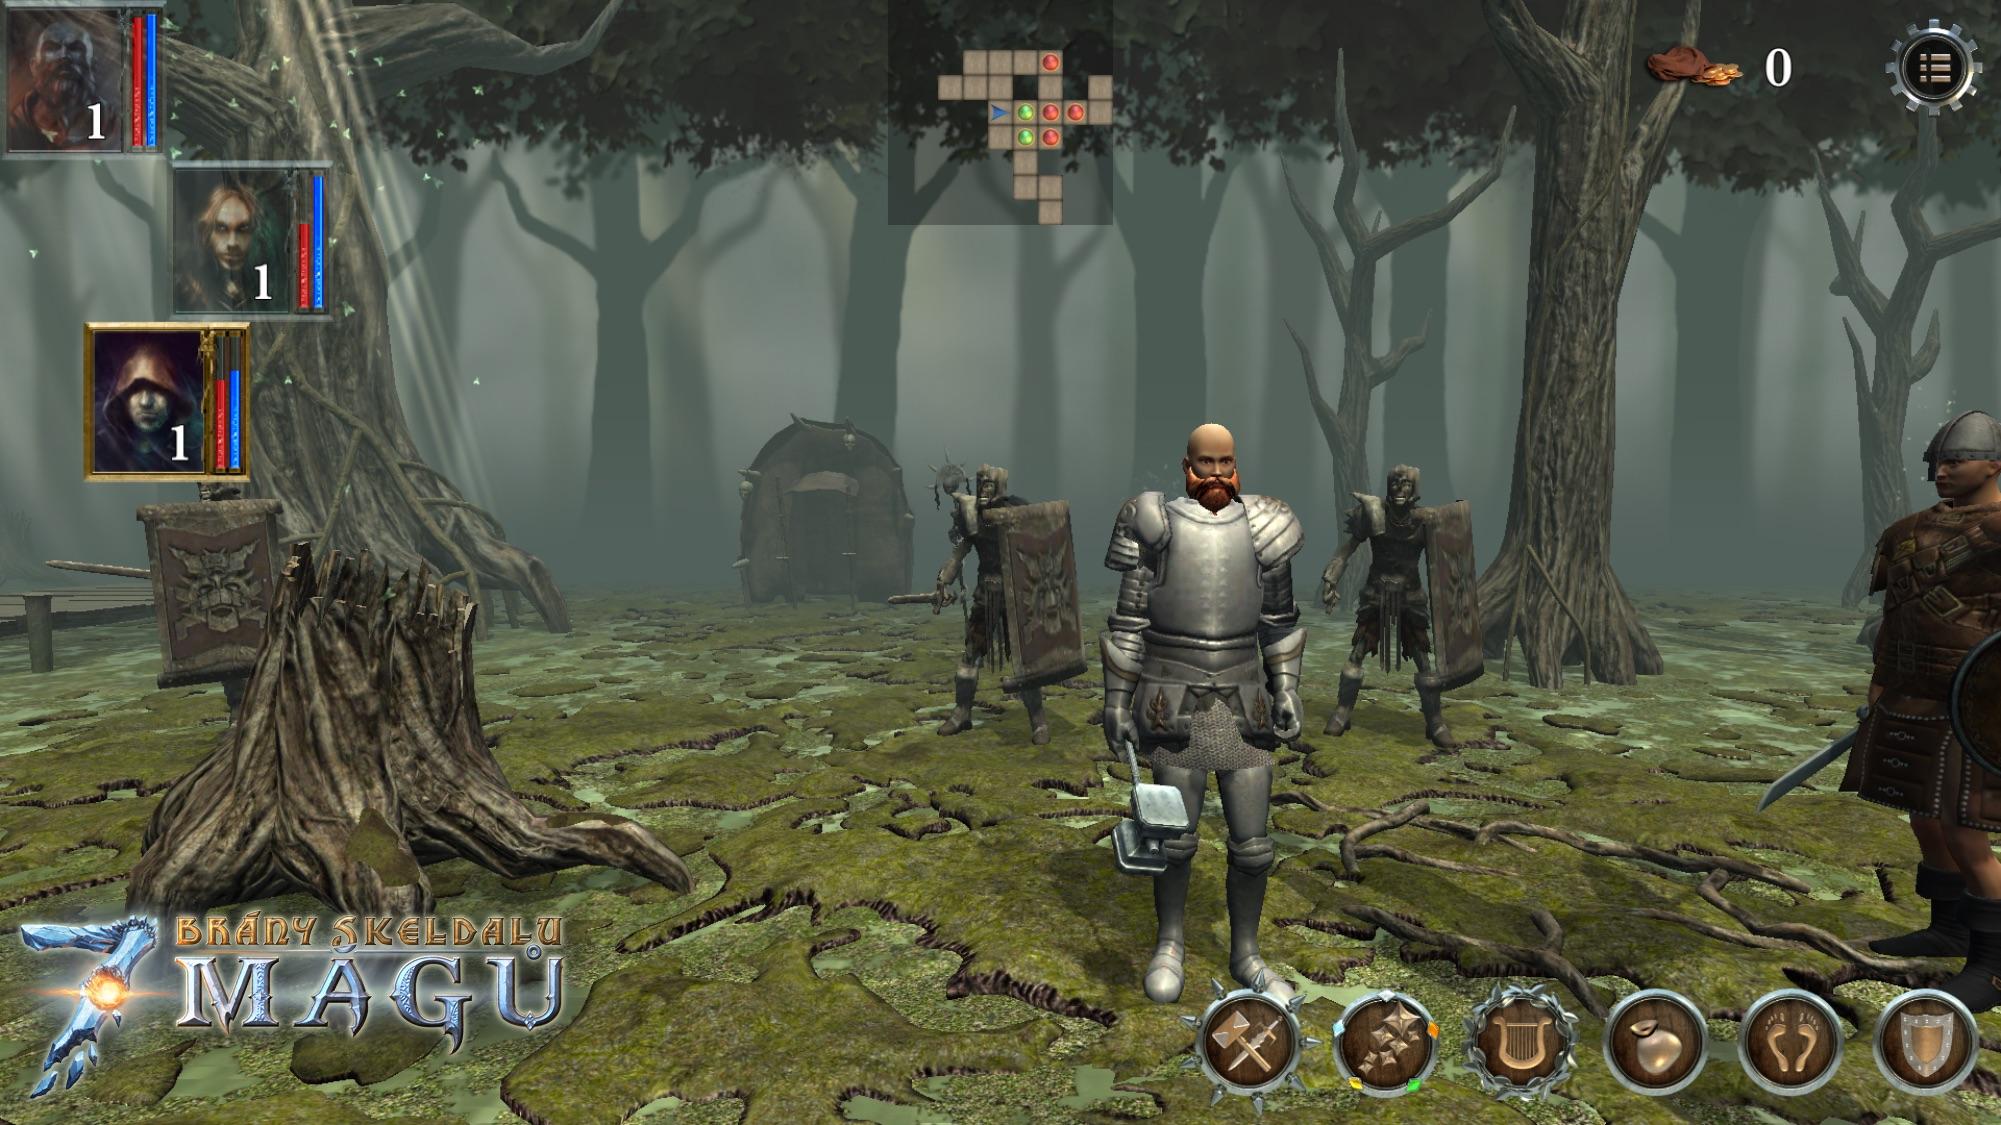 Brány Skeldalu 3: Sedm mágů v prvním gameplay videu 109267